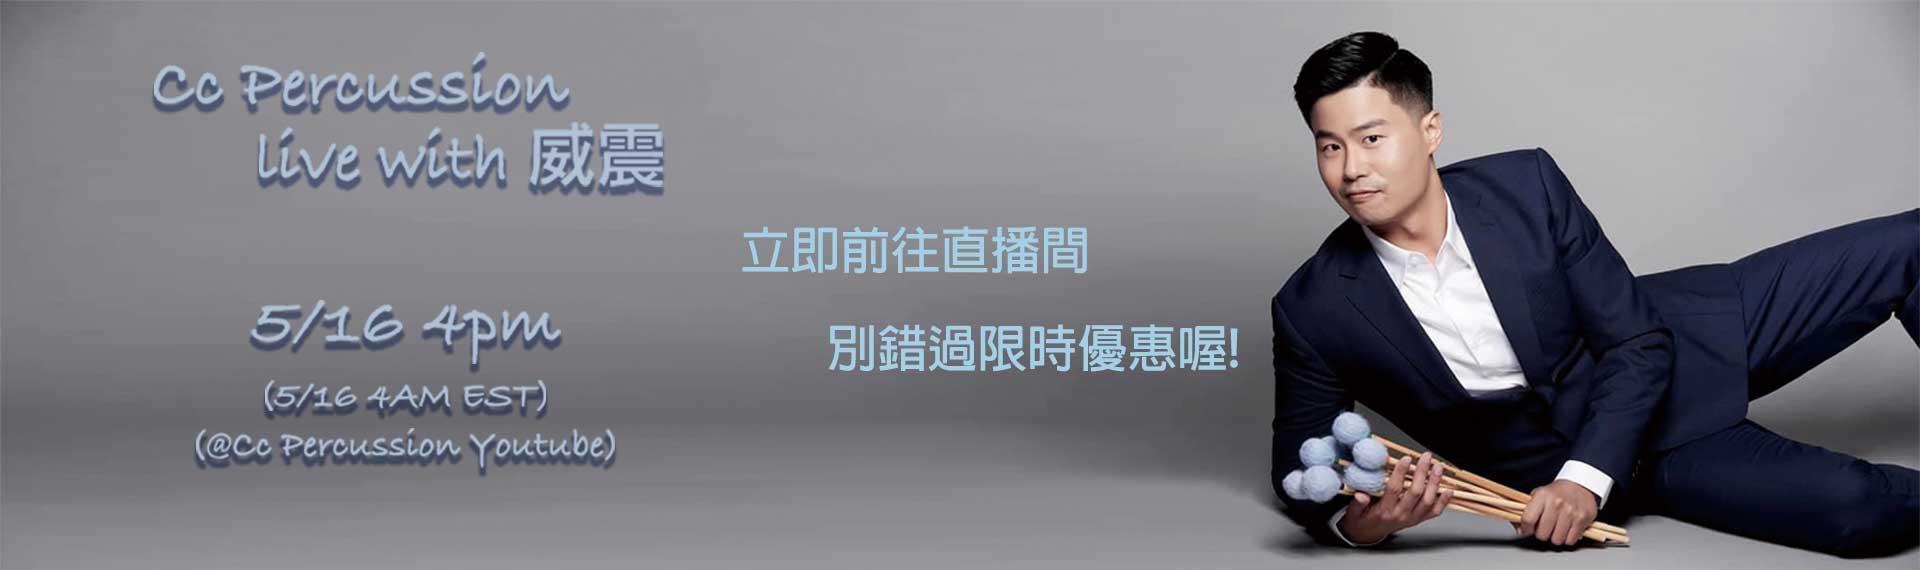 Live with 威震|Cc擊樂實驗室